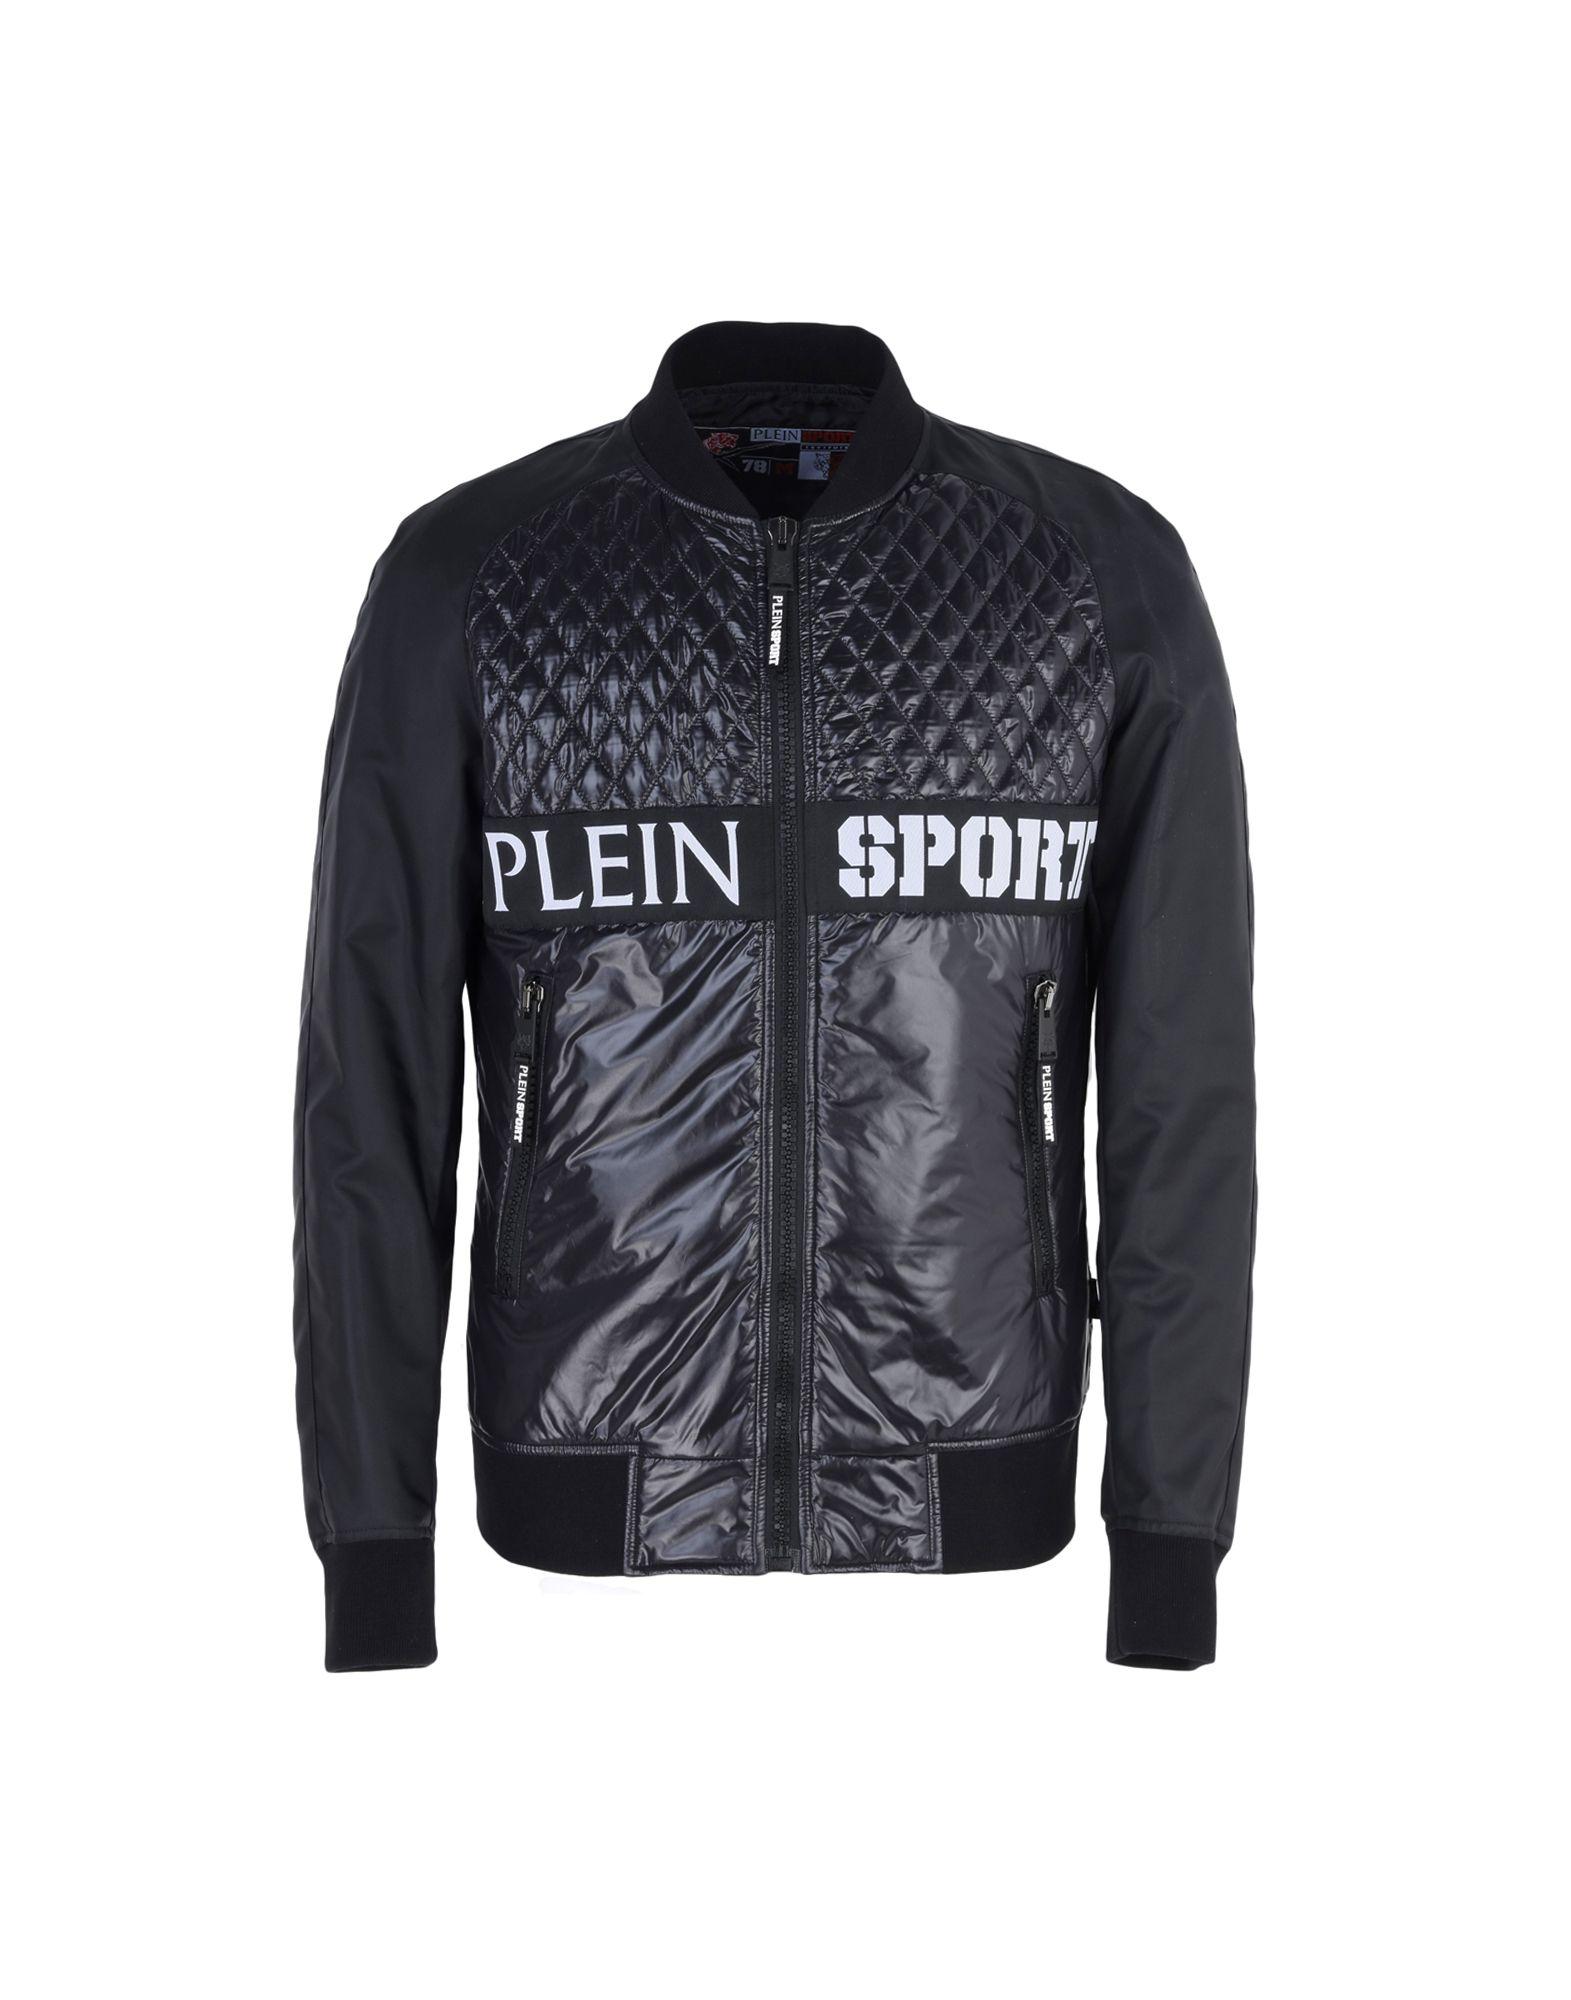 2df873bb5e Plein Sport Nylon Jacket Robert - Bomber - Men Plein Sport Bombers online  on YOOX Australia - 41702970XW